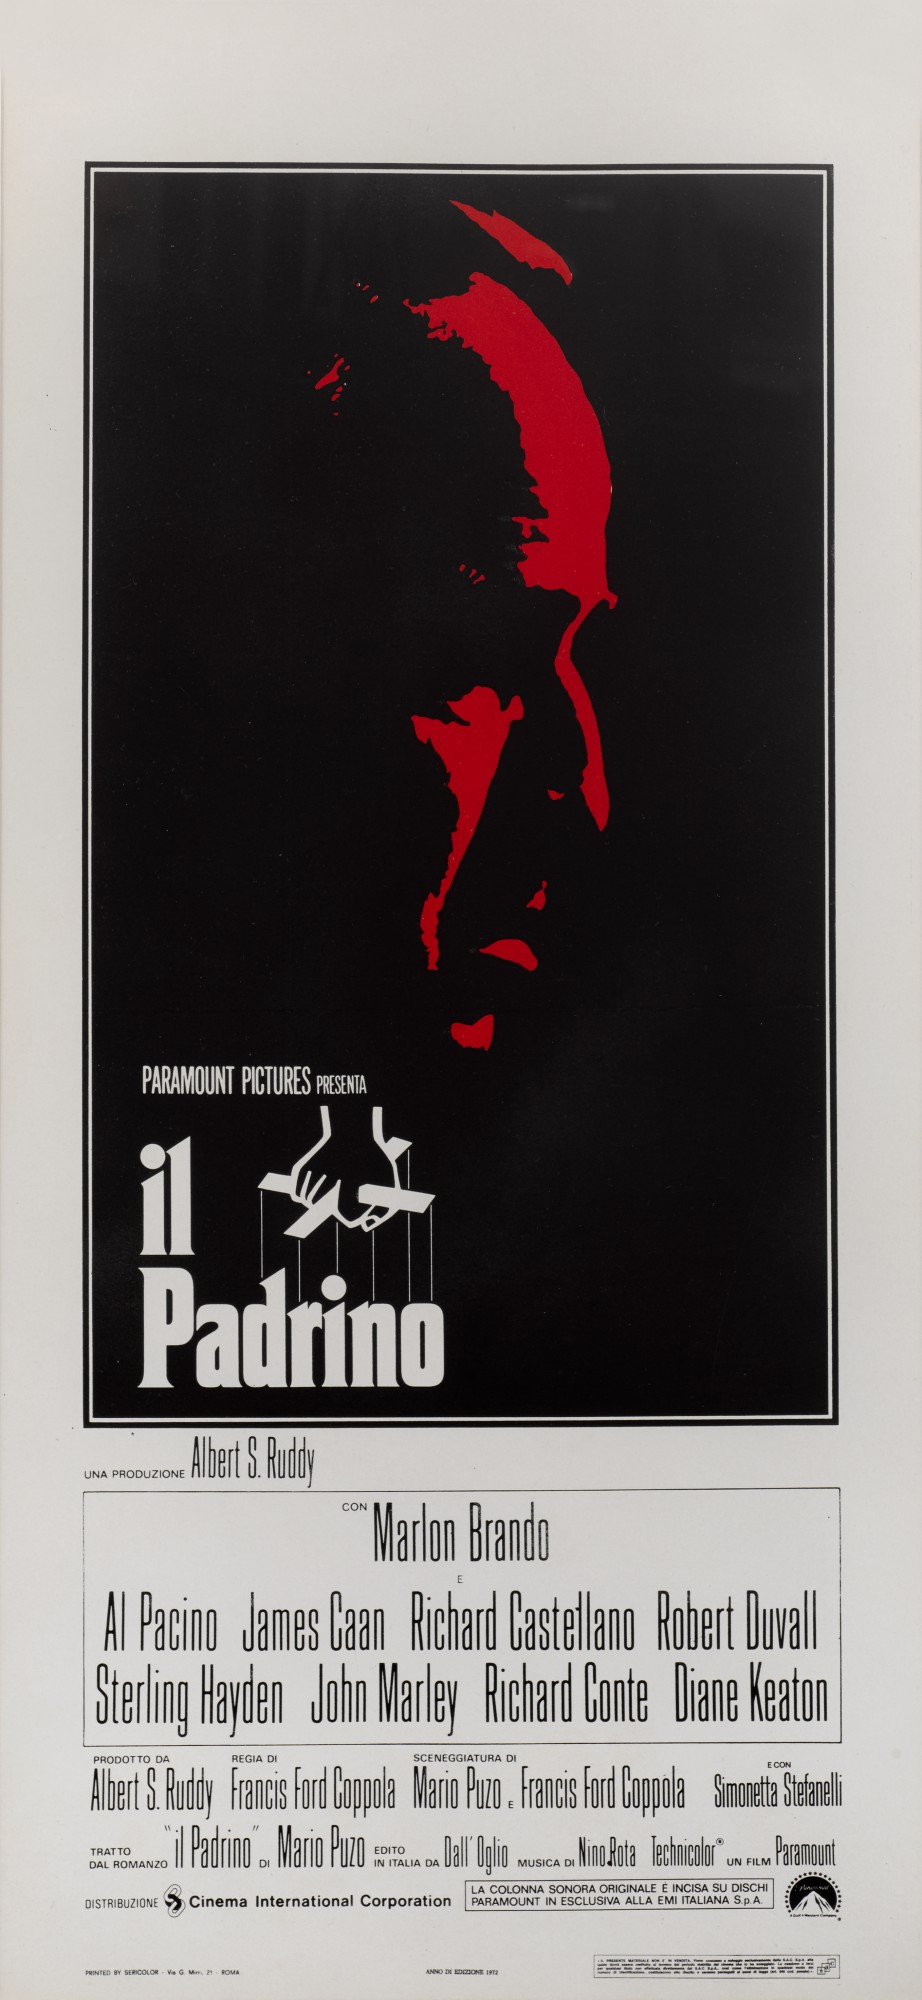 THE GODFATHER / IL PADRINO (1972) POSTER, ITALIAN